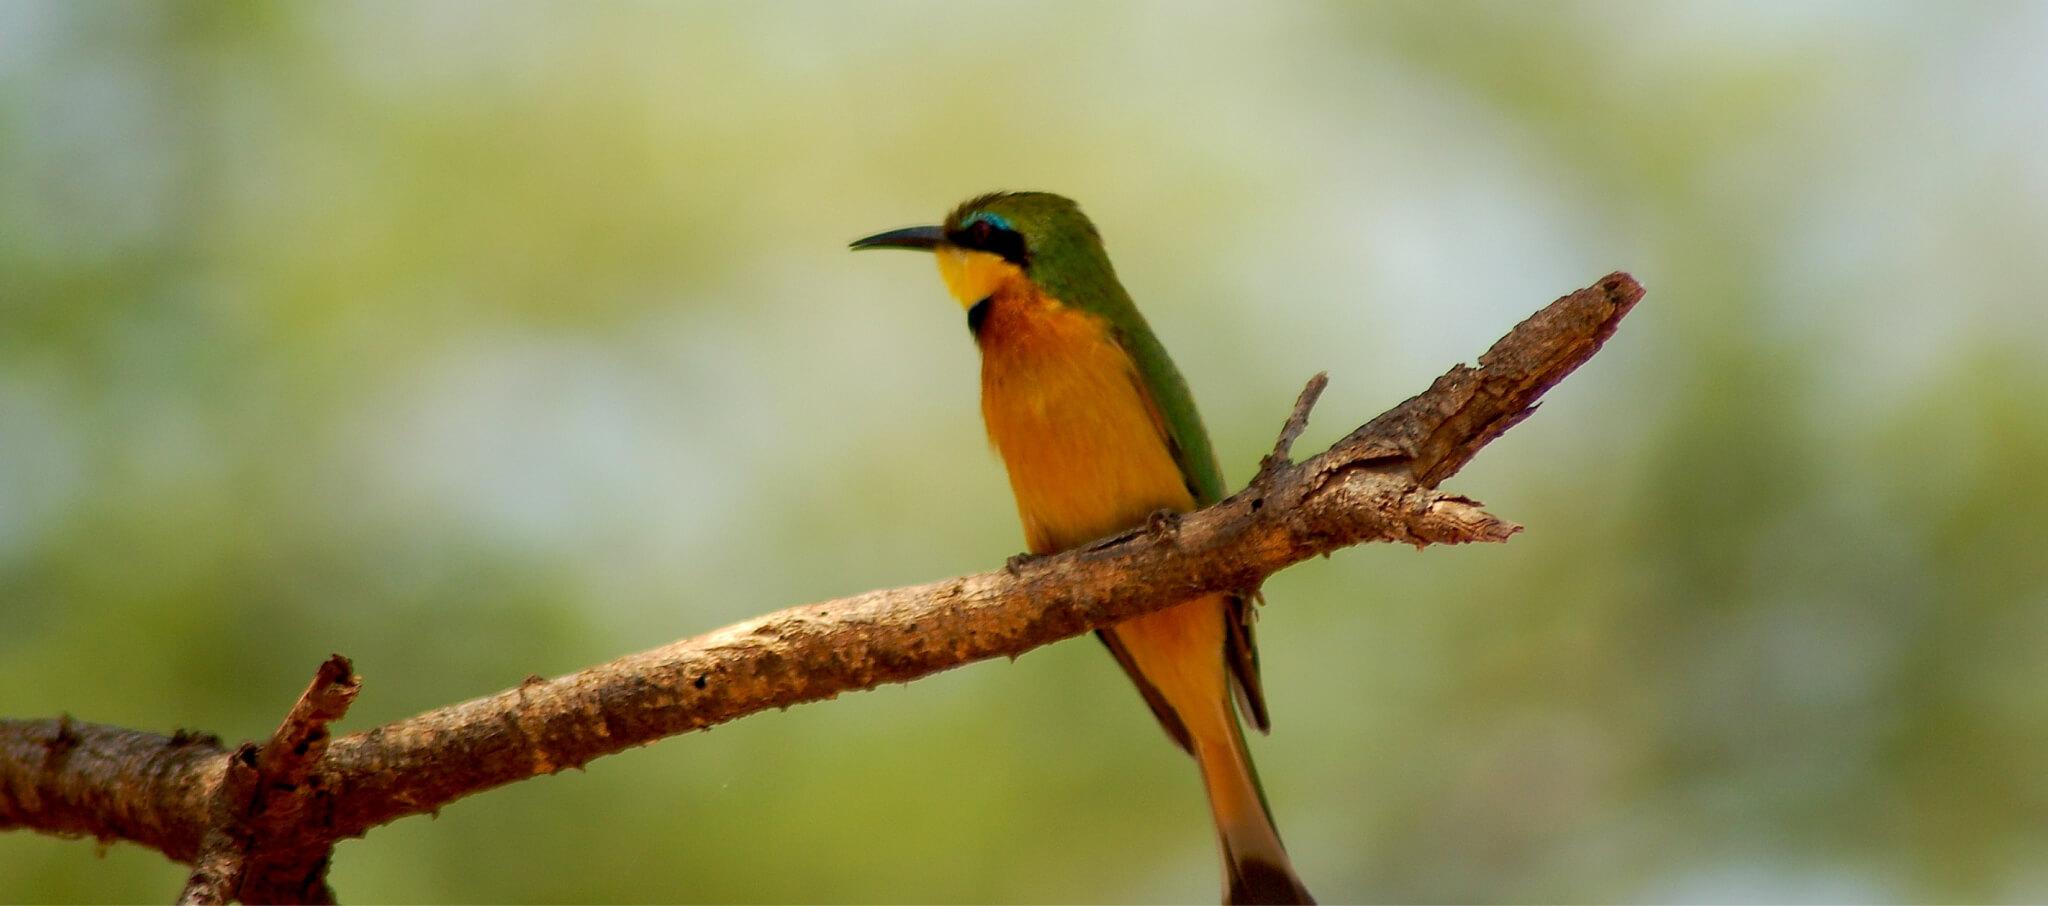 about-bird